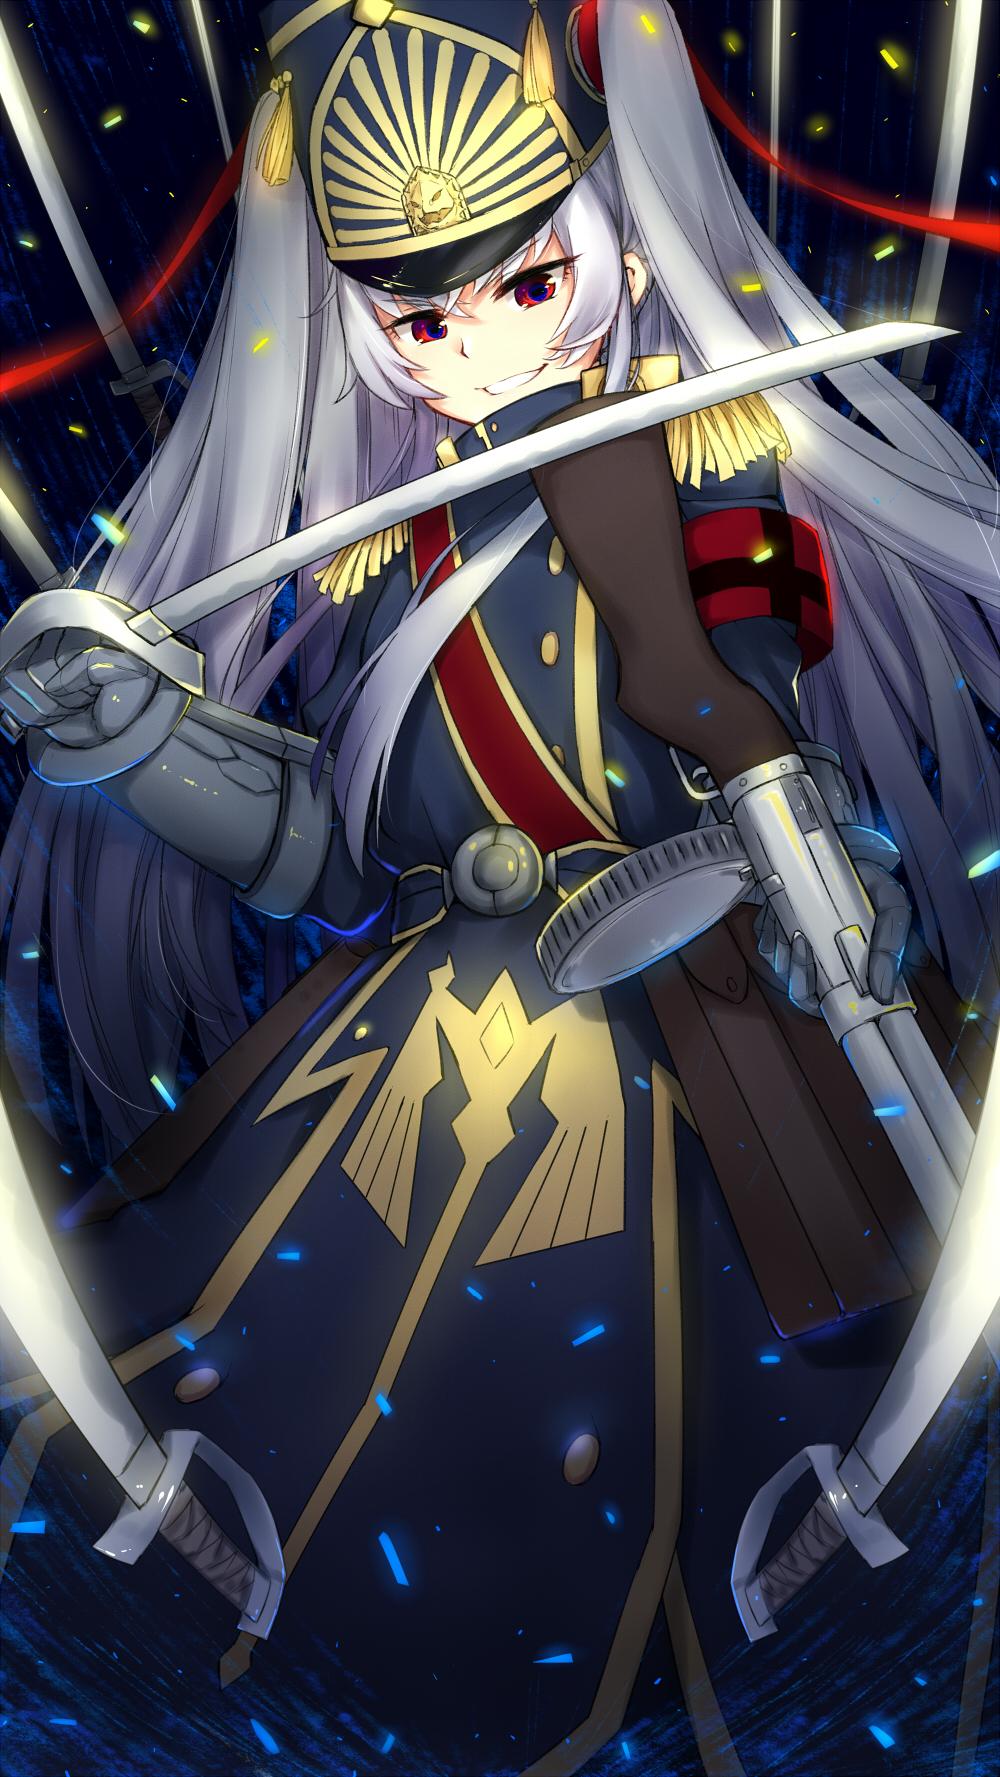 Altair (Re:Creators) Image #2100029 - Zerochan Anime Image ...